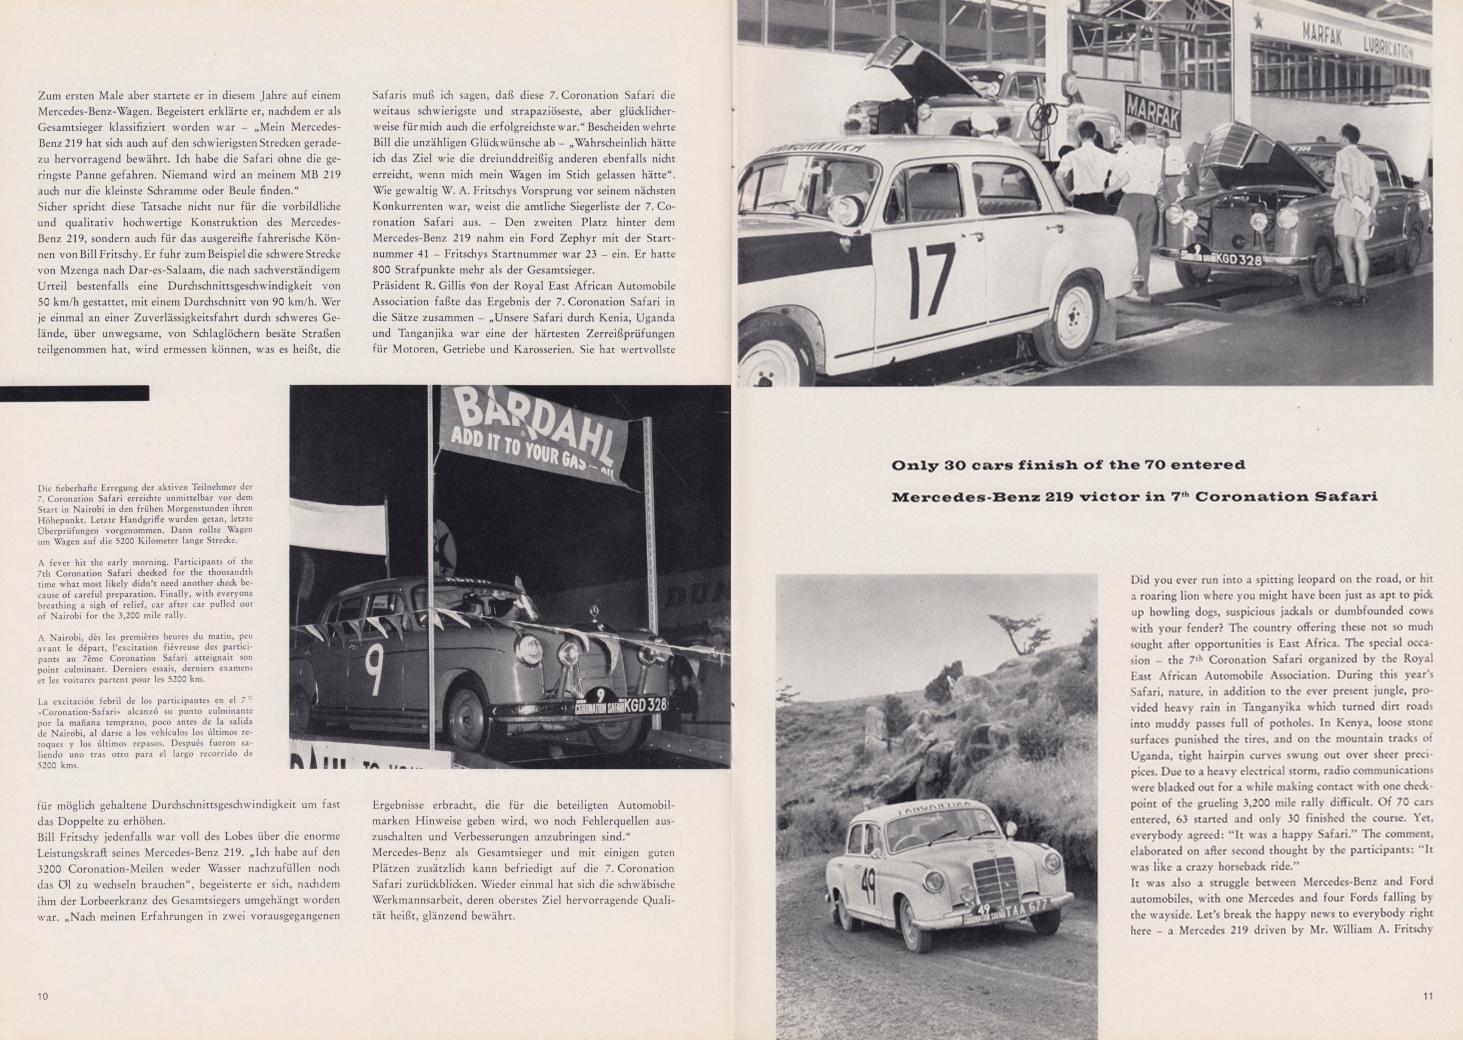 (REVISTA): Periódico In aller welt n.º 33 - Mercedes-Benz no mundo - 1959 - multilingue 006